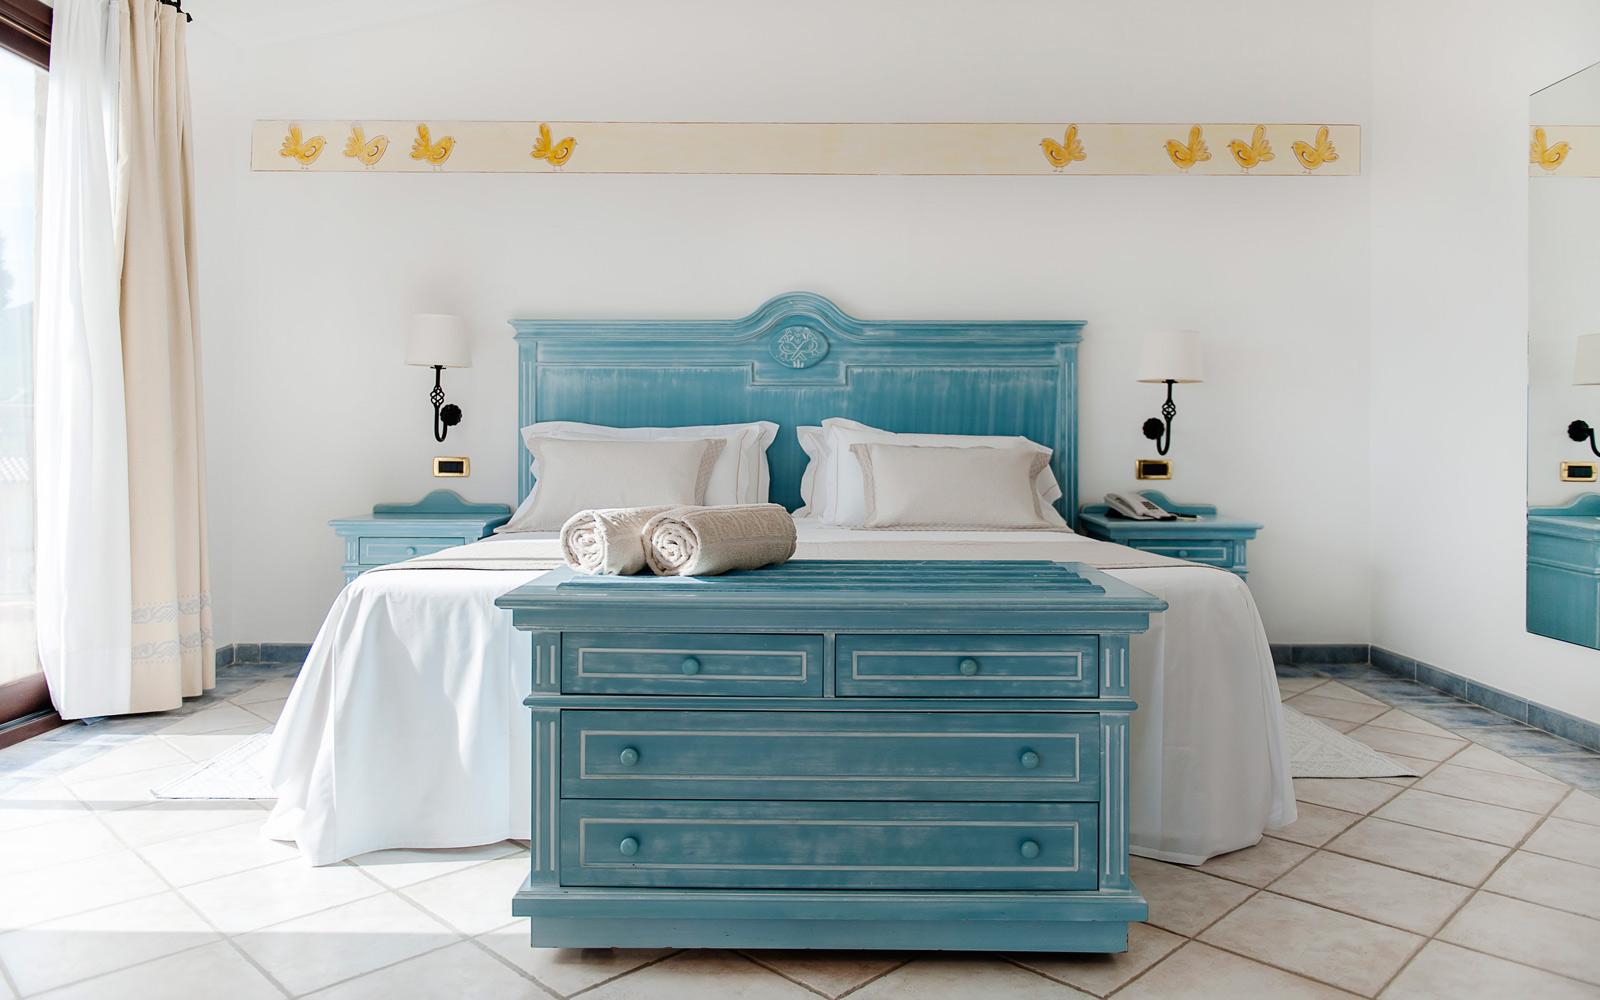 Standard Room at Hotel Abi D'Oru